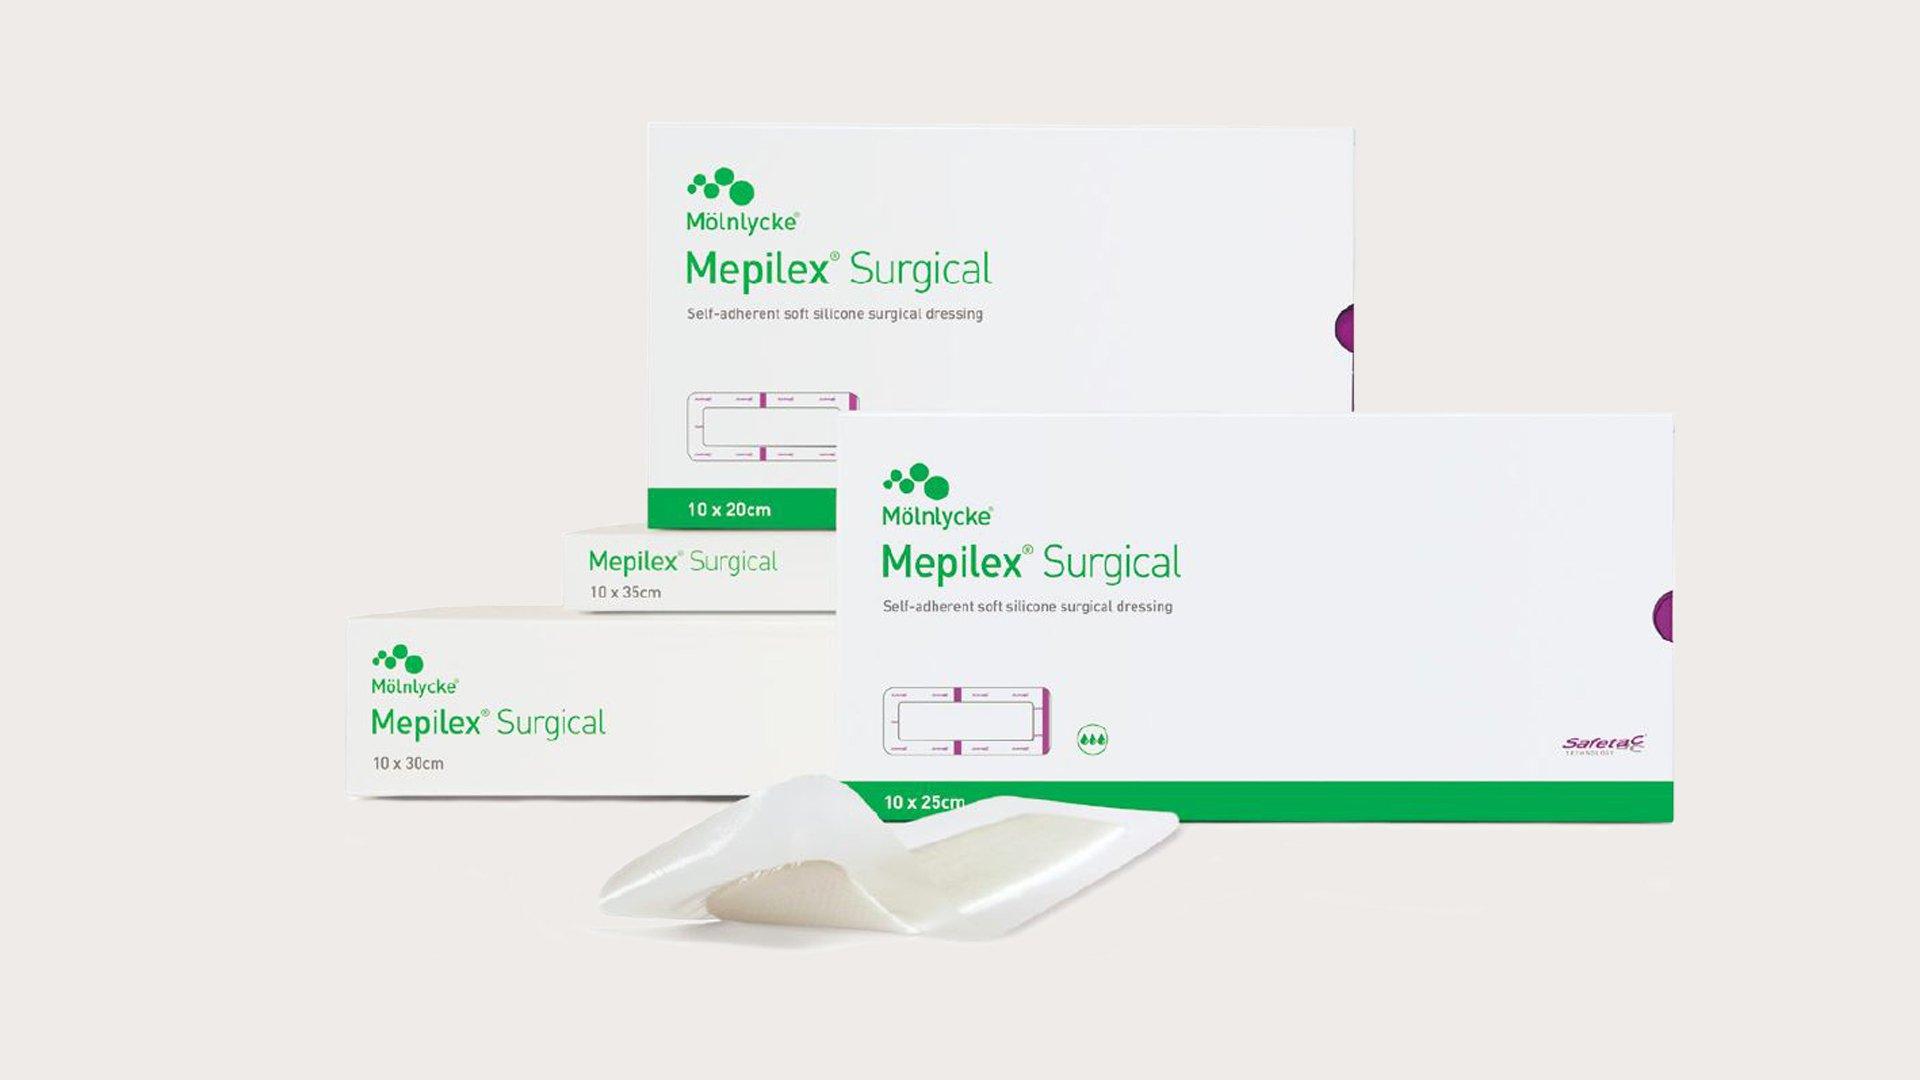 Mepilex Surgical image